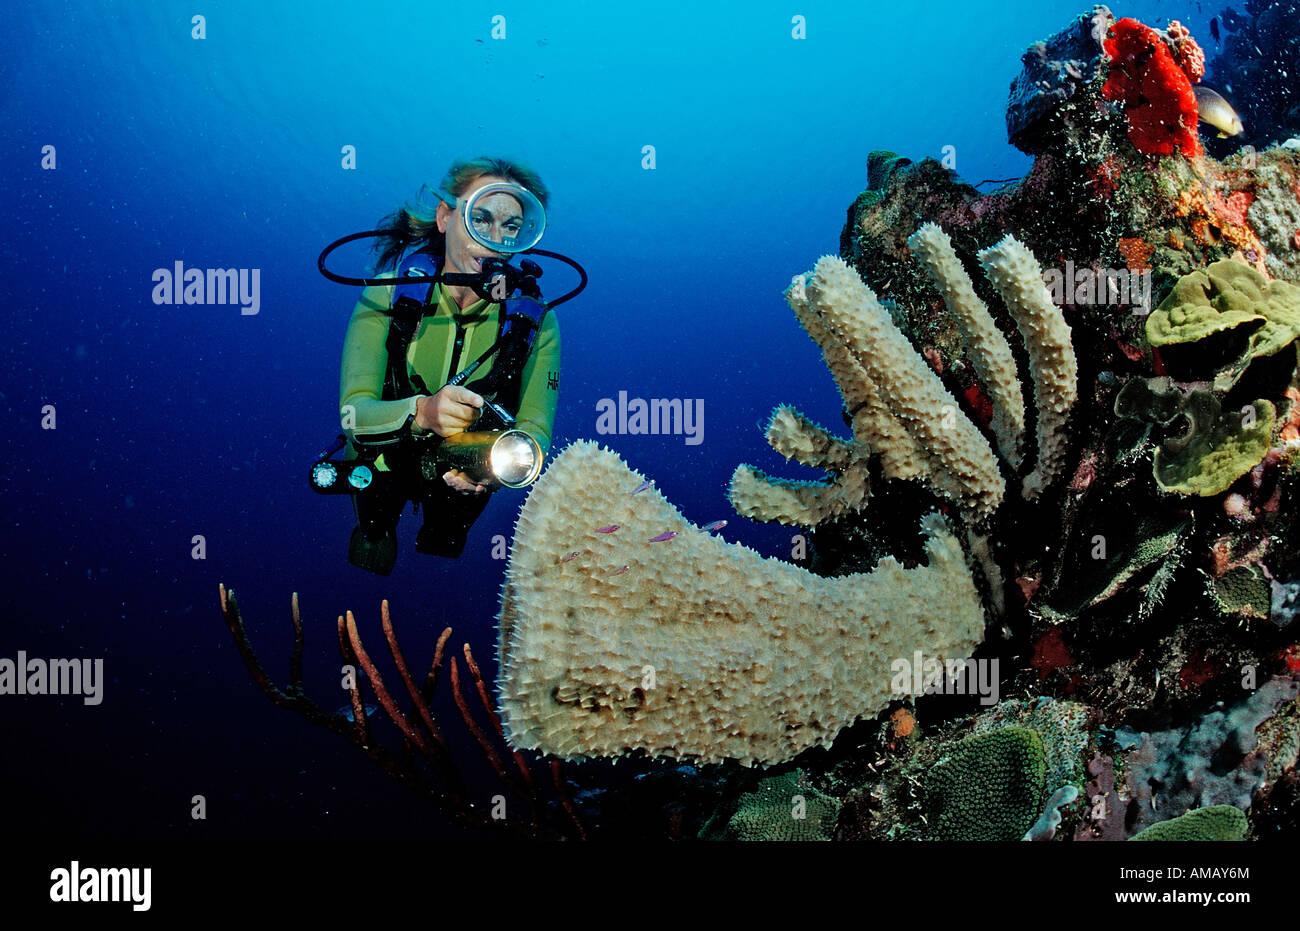 Scuba Diver e barriera corallina Saint Lucia French West Indies Mar dei Caraibi Immagini Stock